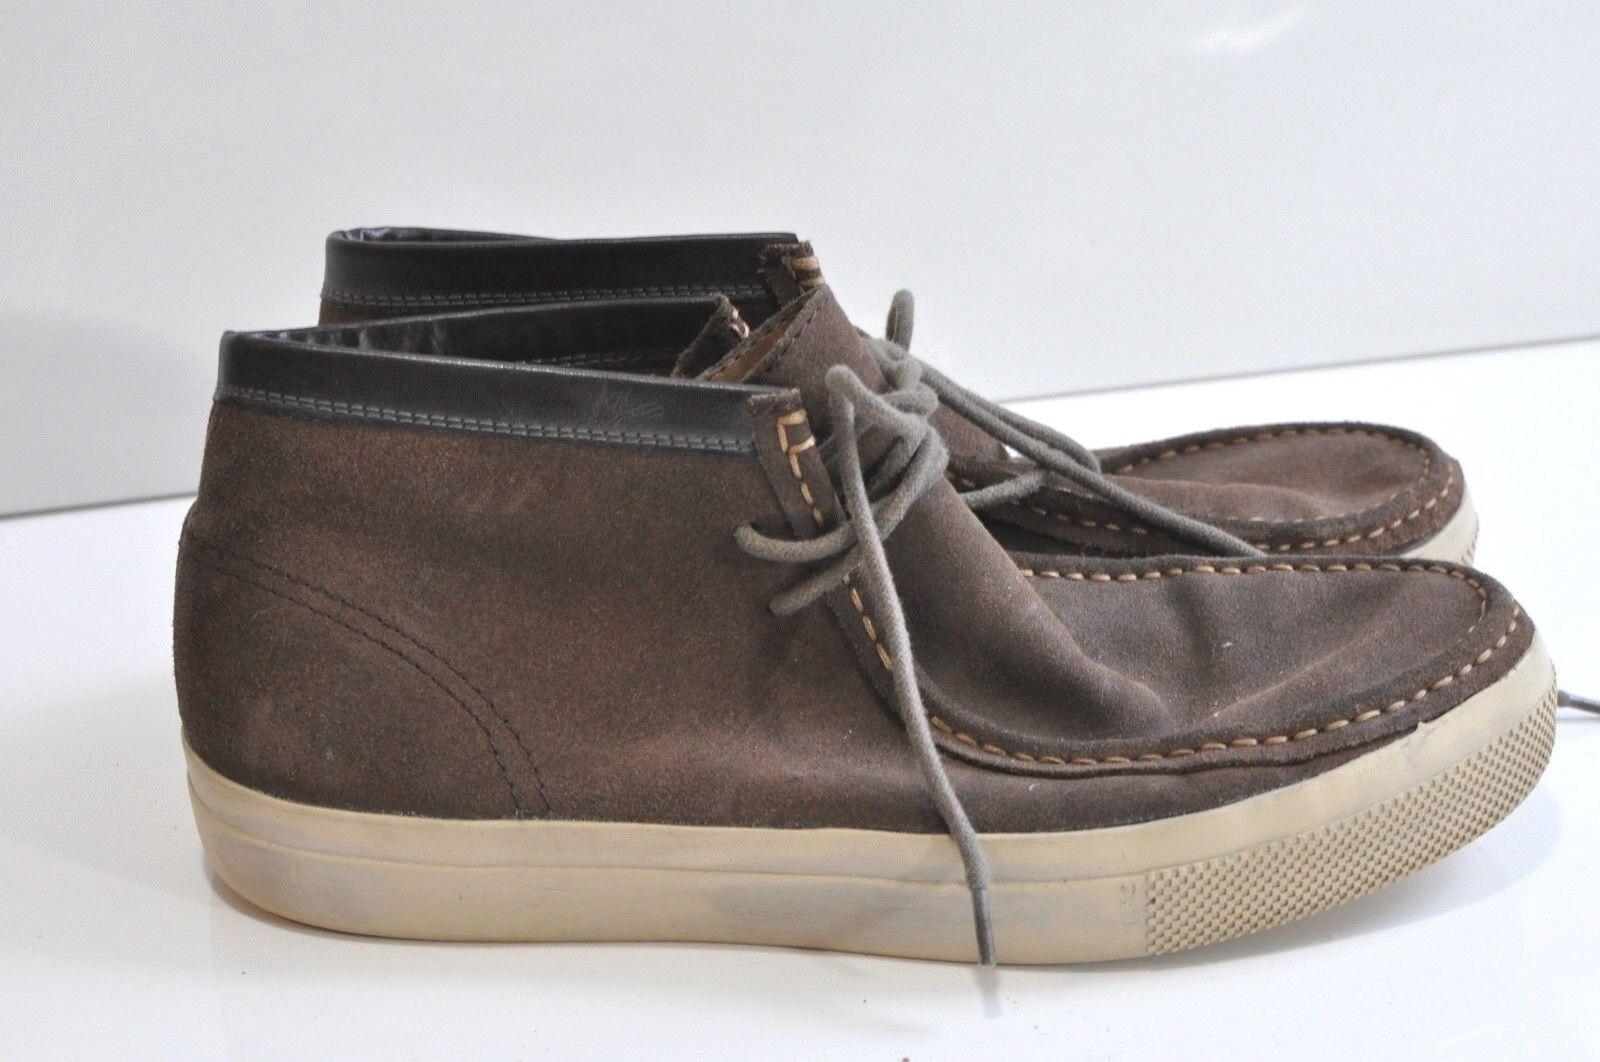 Von Dutch Spokes Mens leather sneakers size 9.5